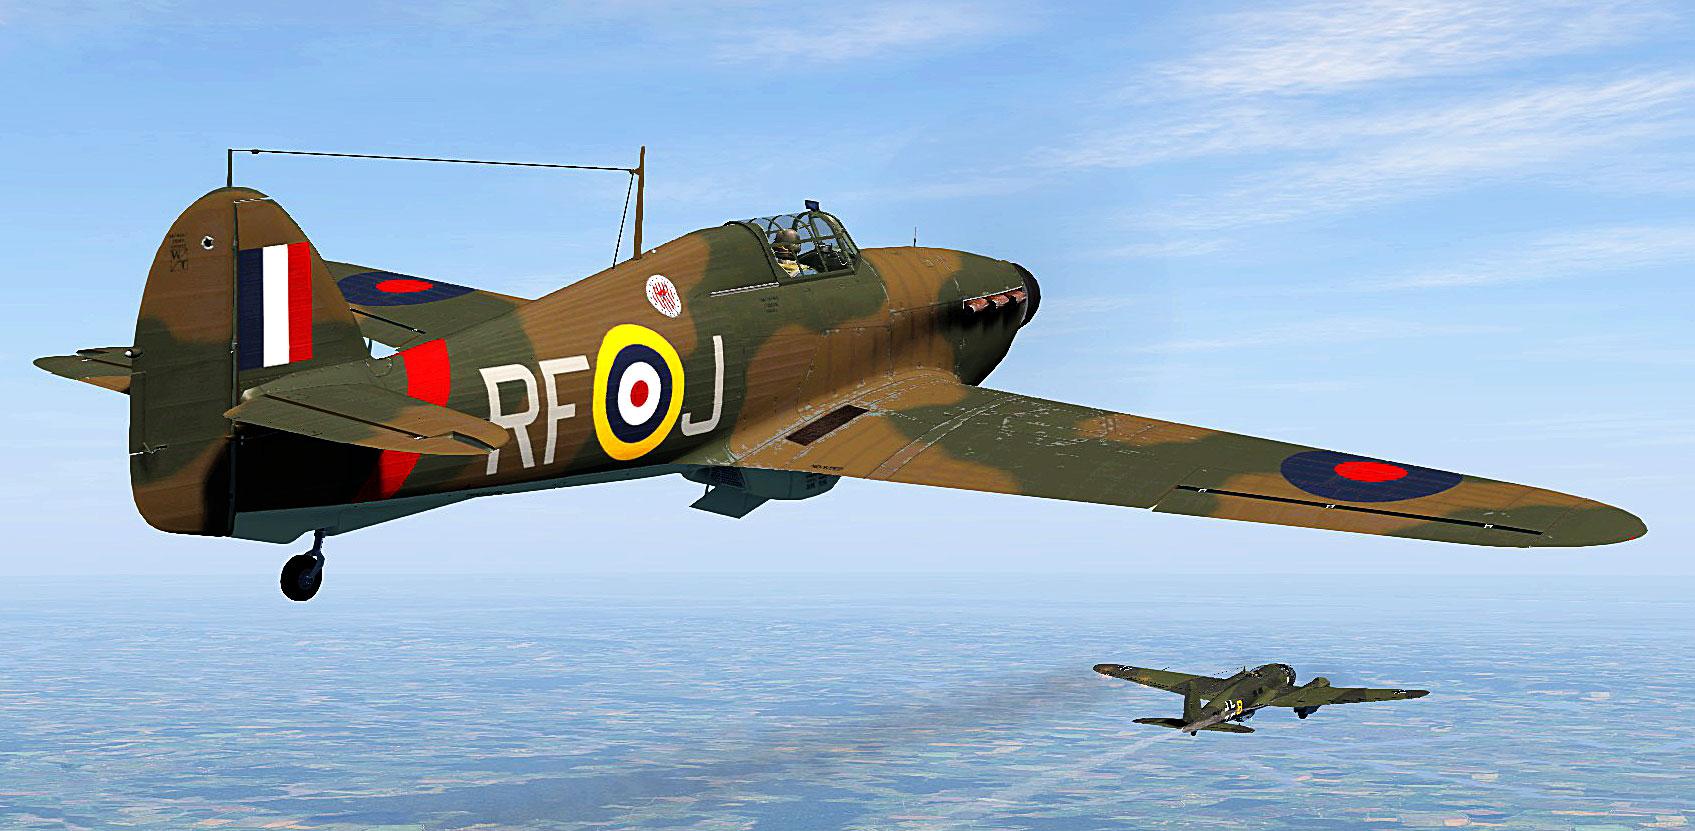 COD SO Hurricane I RAF 303Sqn RFJ Tadeusz Anduszkow V6665 attacking a Heinkel over England V01